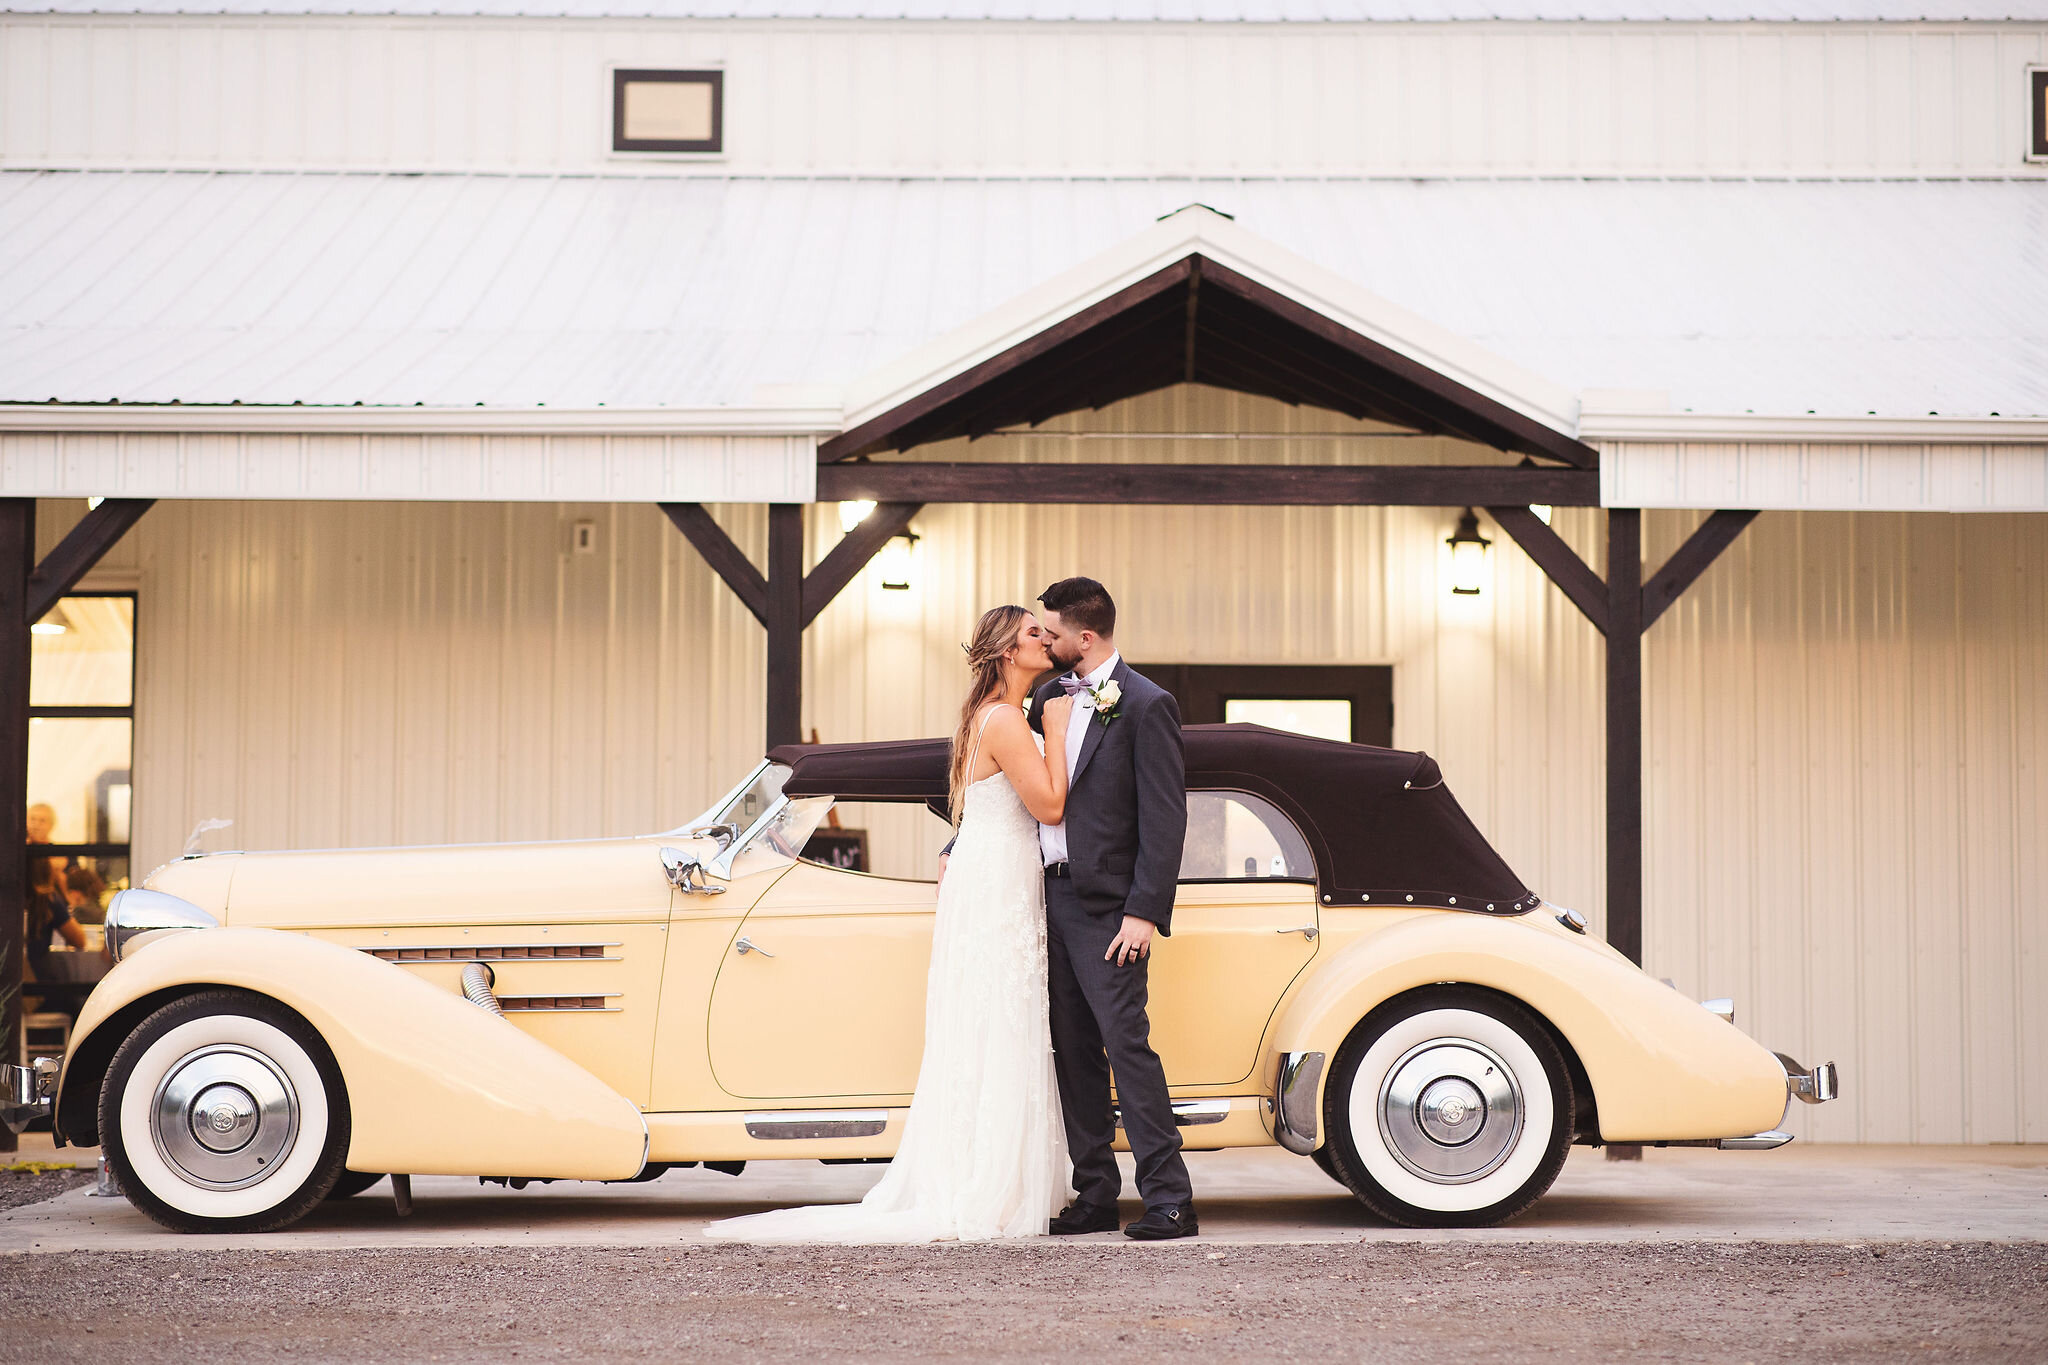 Oklahoma Summer Wedding Venue Dream Point Ranch 40.jpg